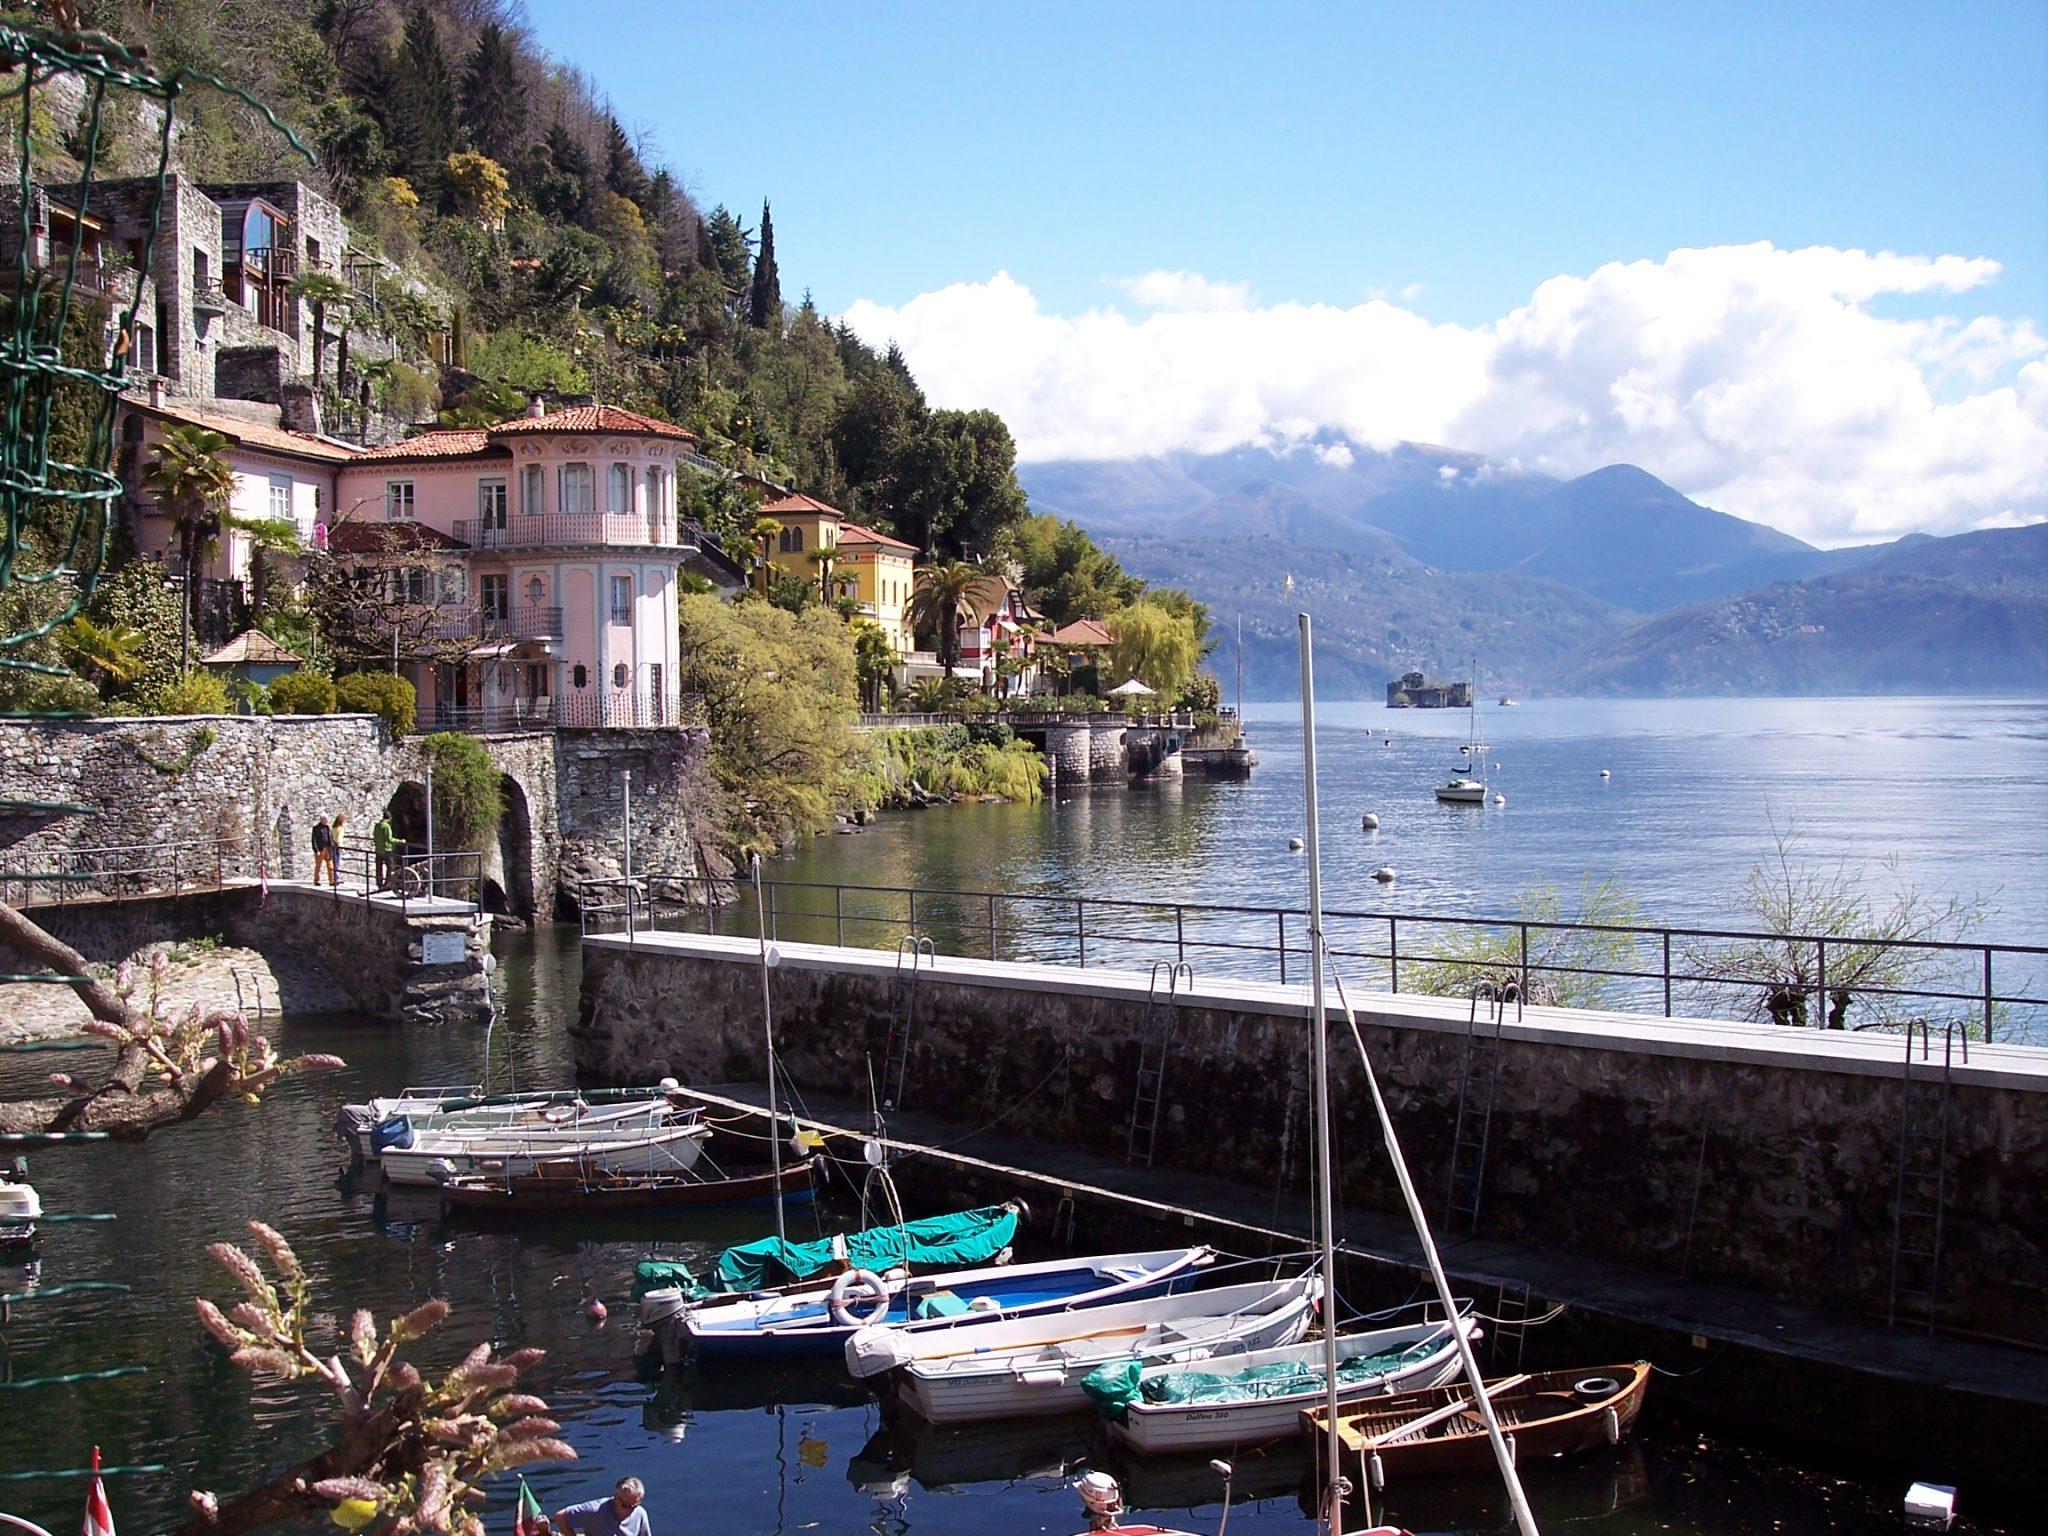 Motorhome tour: Impressive Italian Lakes & Cities Lago Maggiore